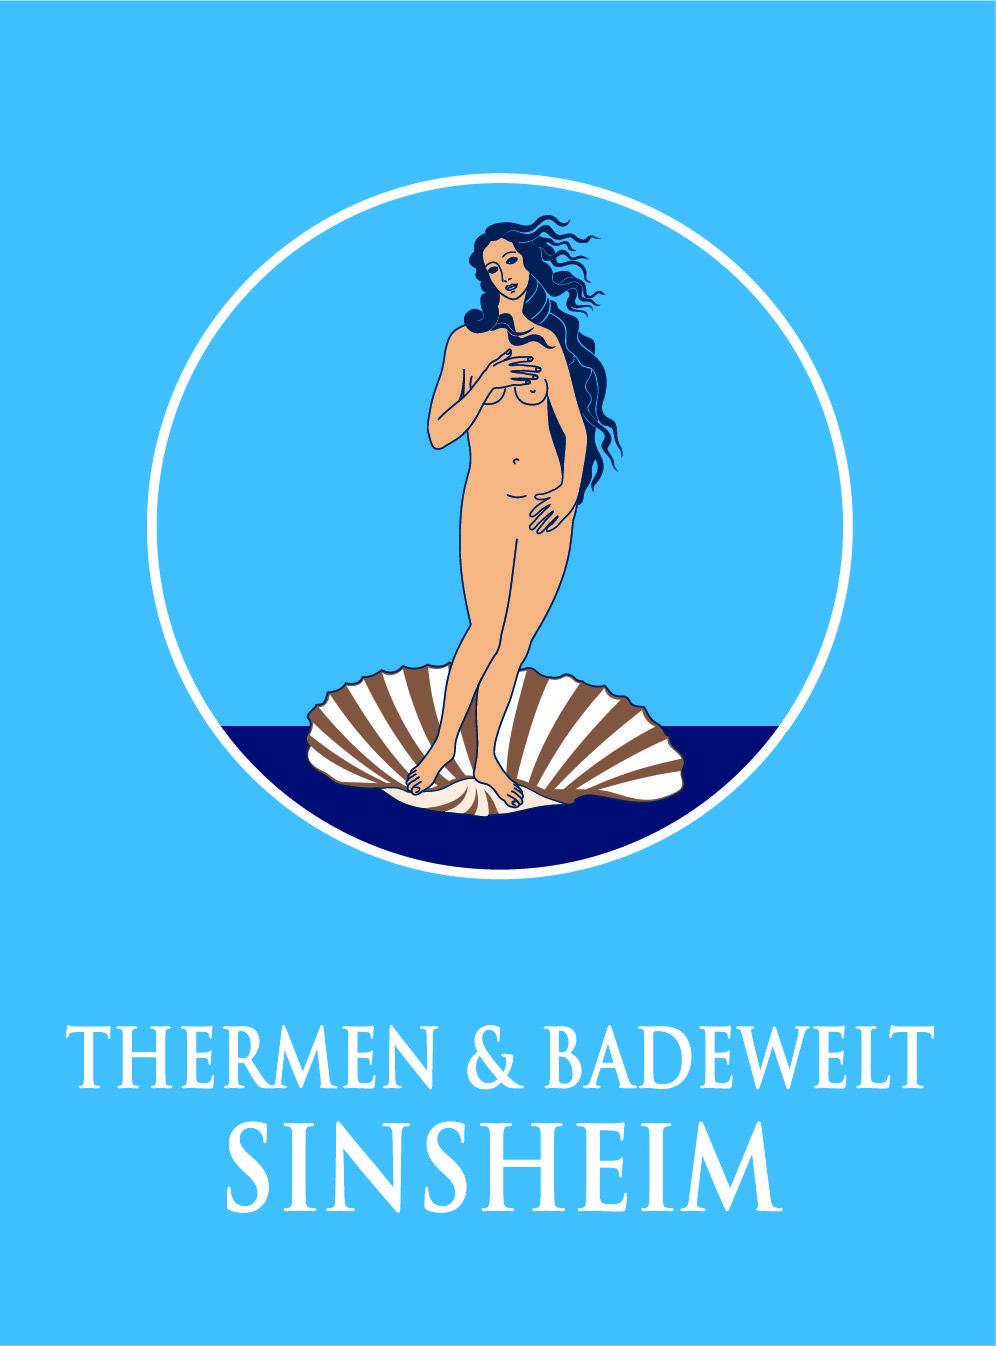 Logo THERMEN & BADEWELT SINSHEIM